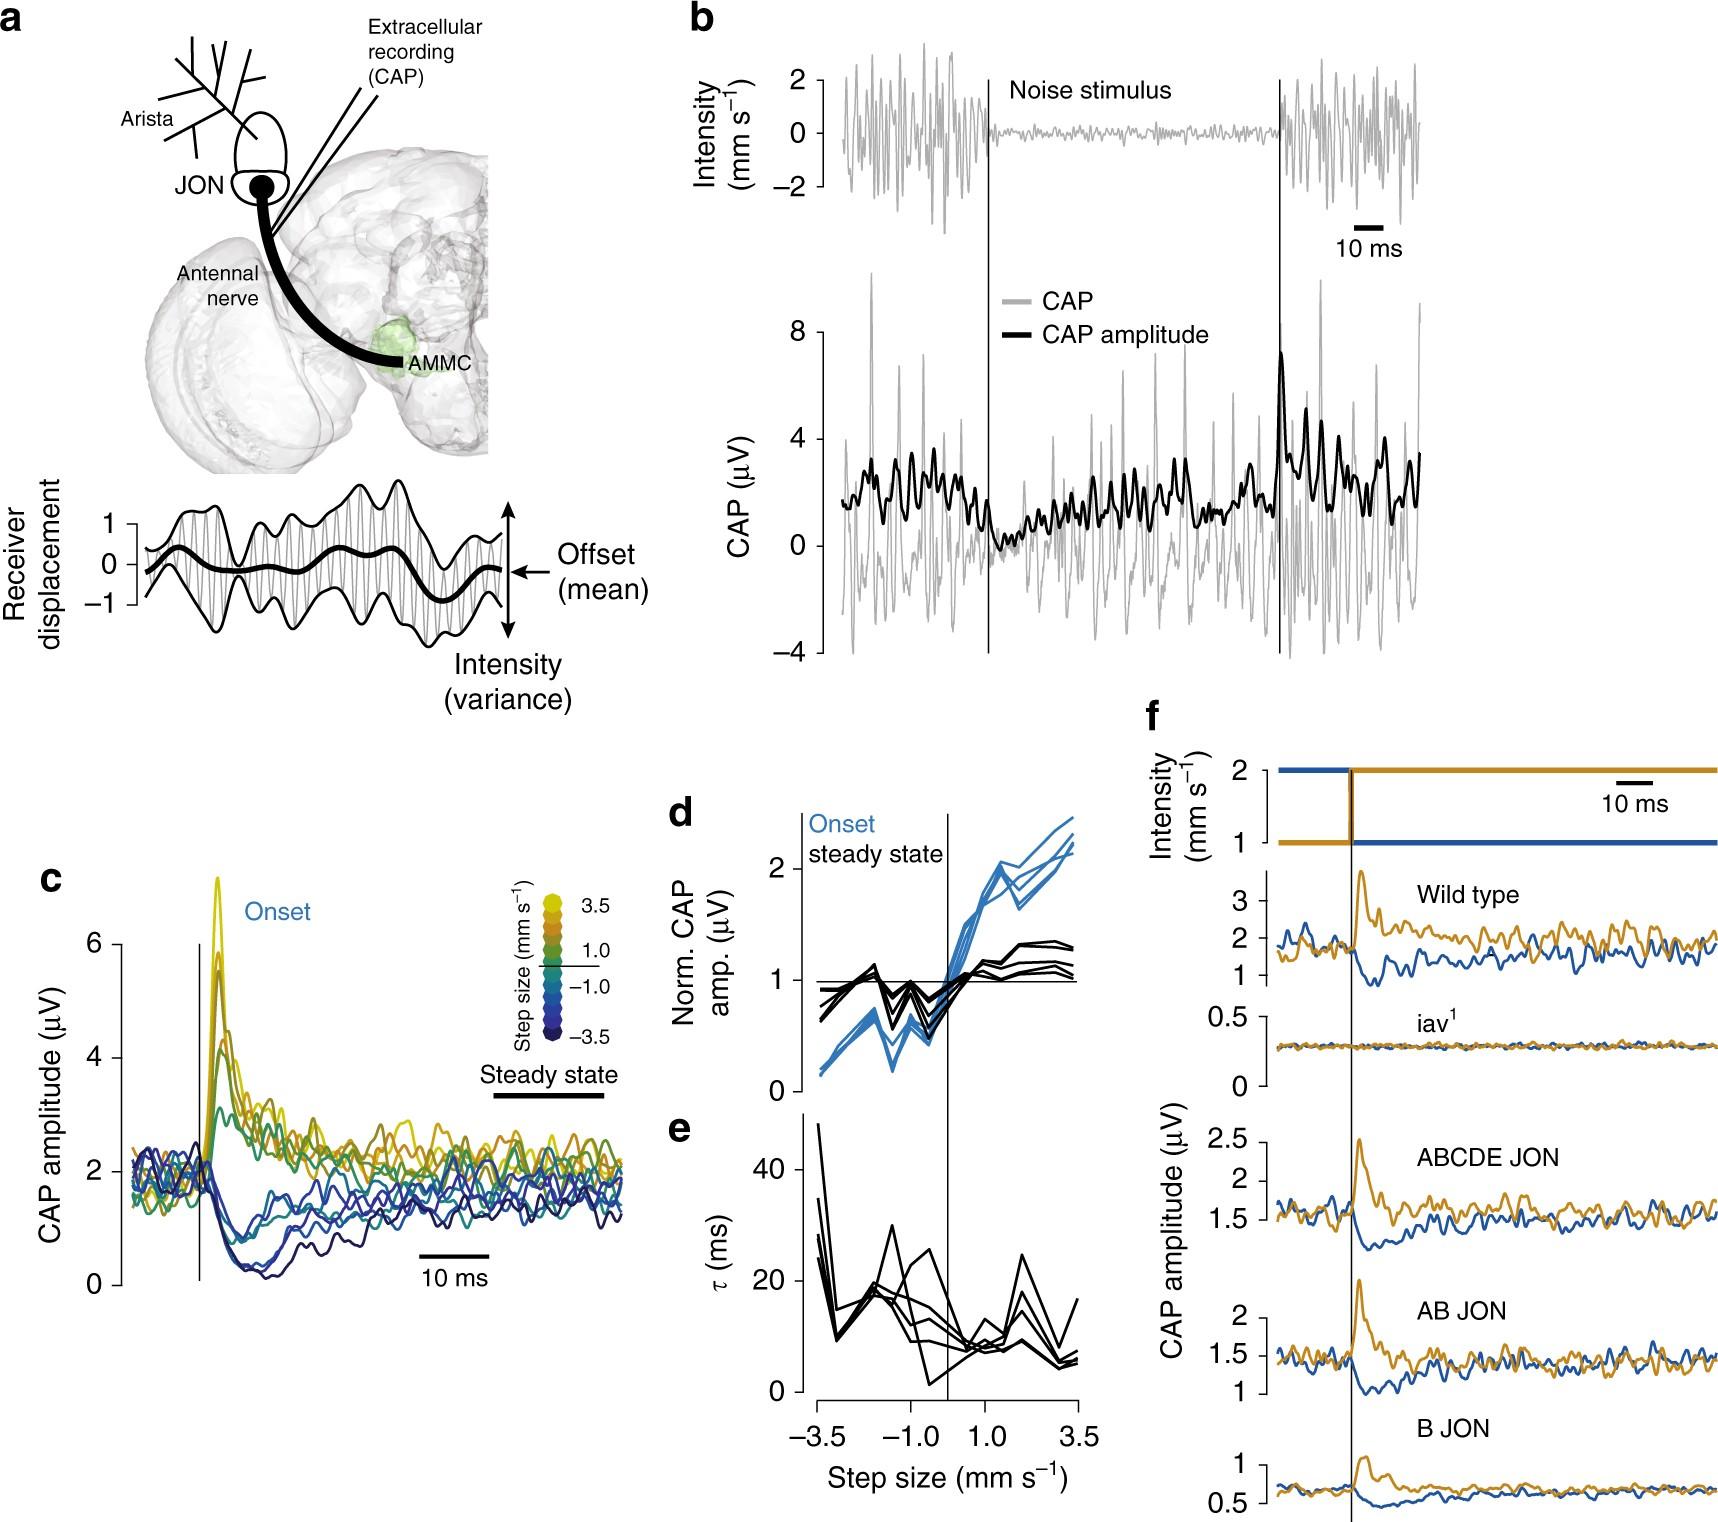 Fast Intensity Adaptation Enhances The Encoding Of Sound In Astatic Jt 30 Wiring Diagram Drosophila Nature Communications